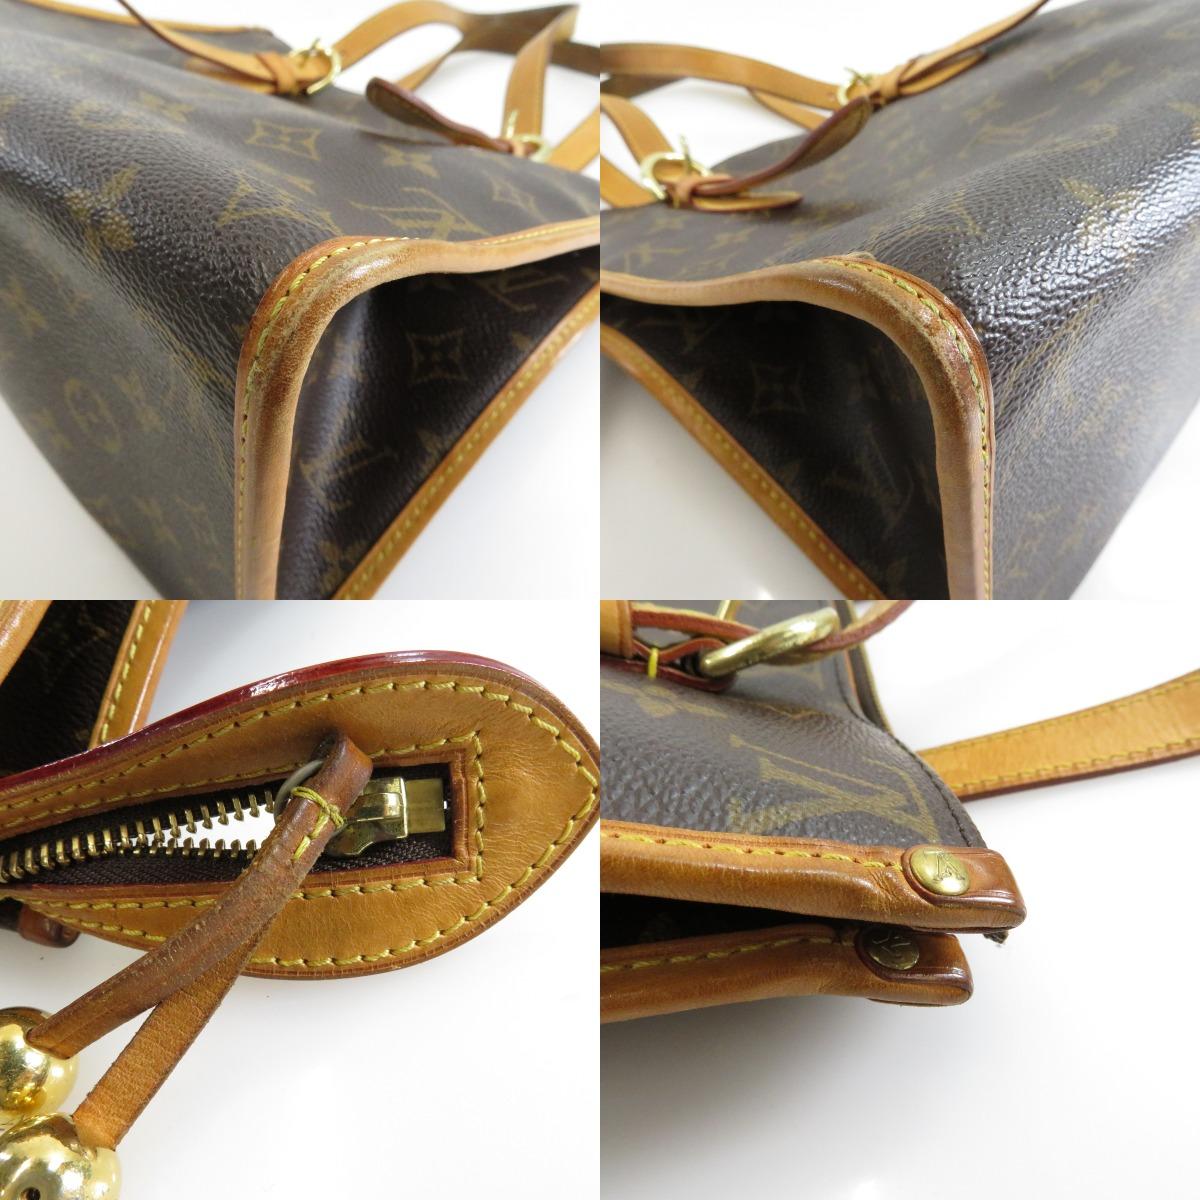 路易 · 威登 popenool o M40007 手提袋 Monogram 帆布女士